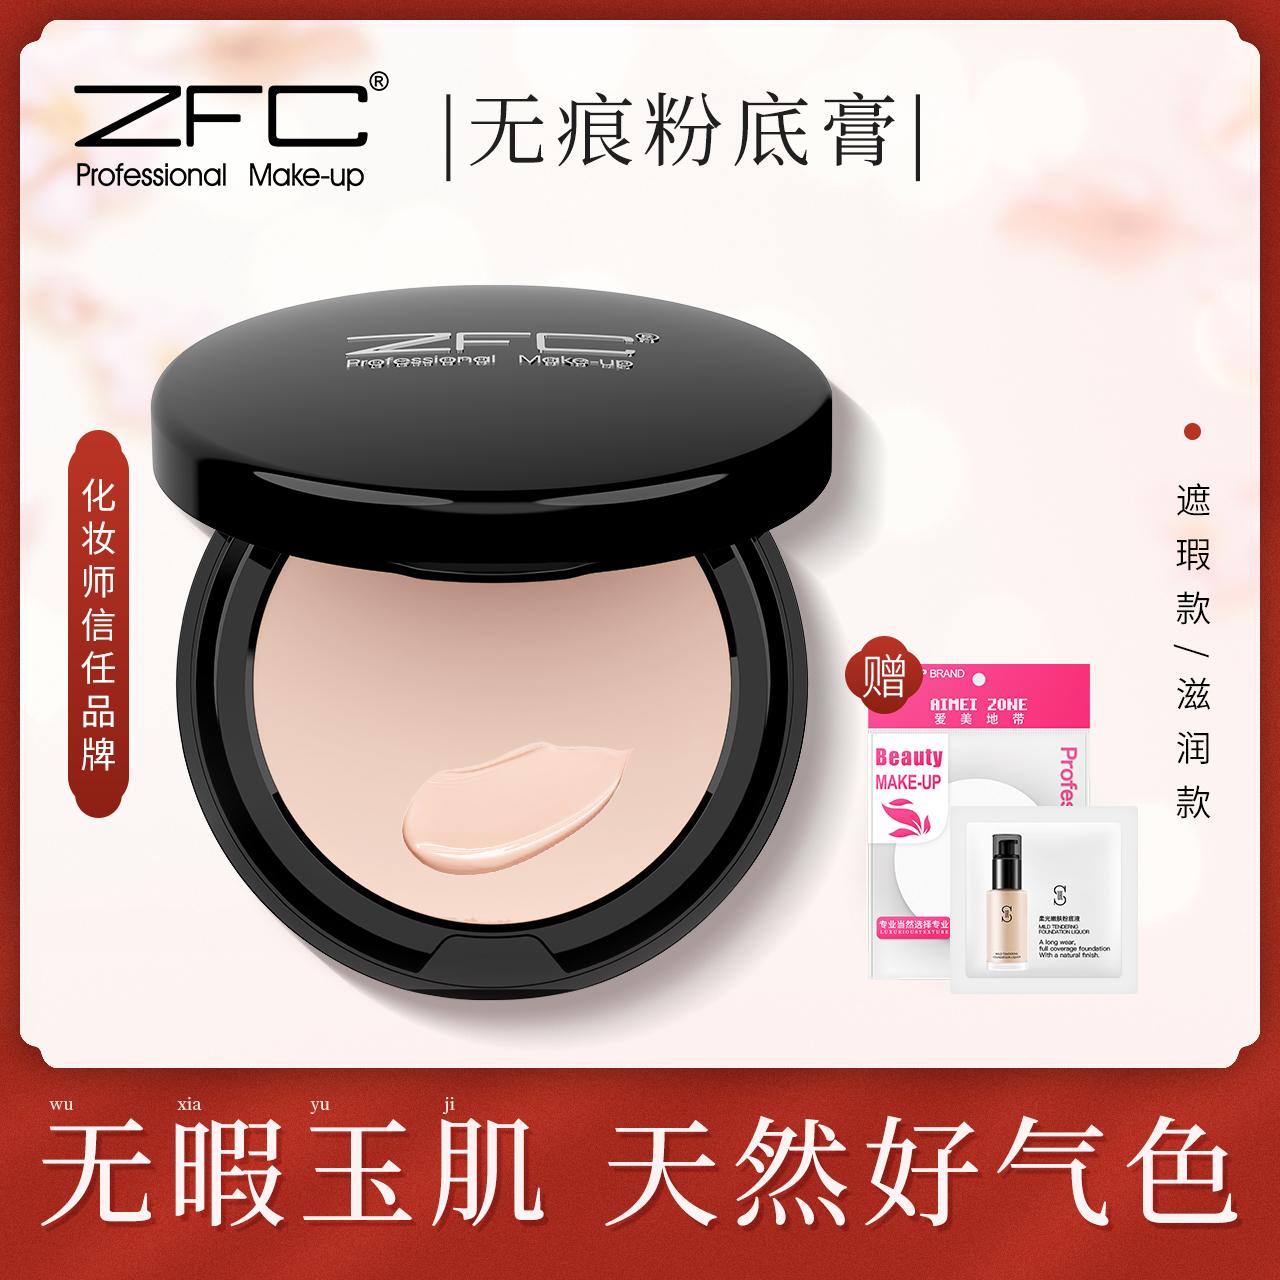 ZFCファンデーション正規品コンシーラーそばかす天然痘プリントファンデーション明るい肌保湿、目の周りを覆い隠します。